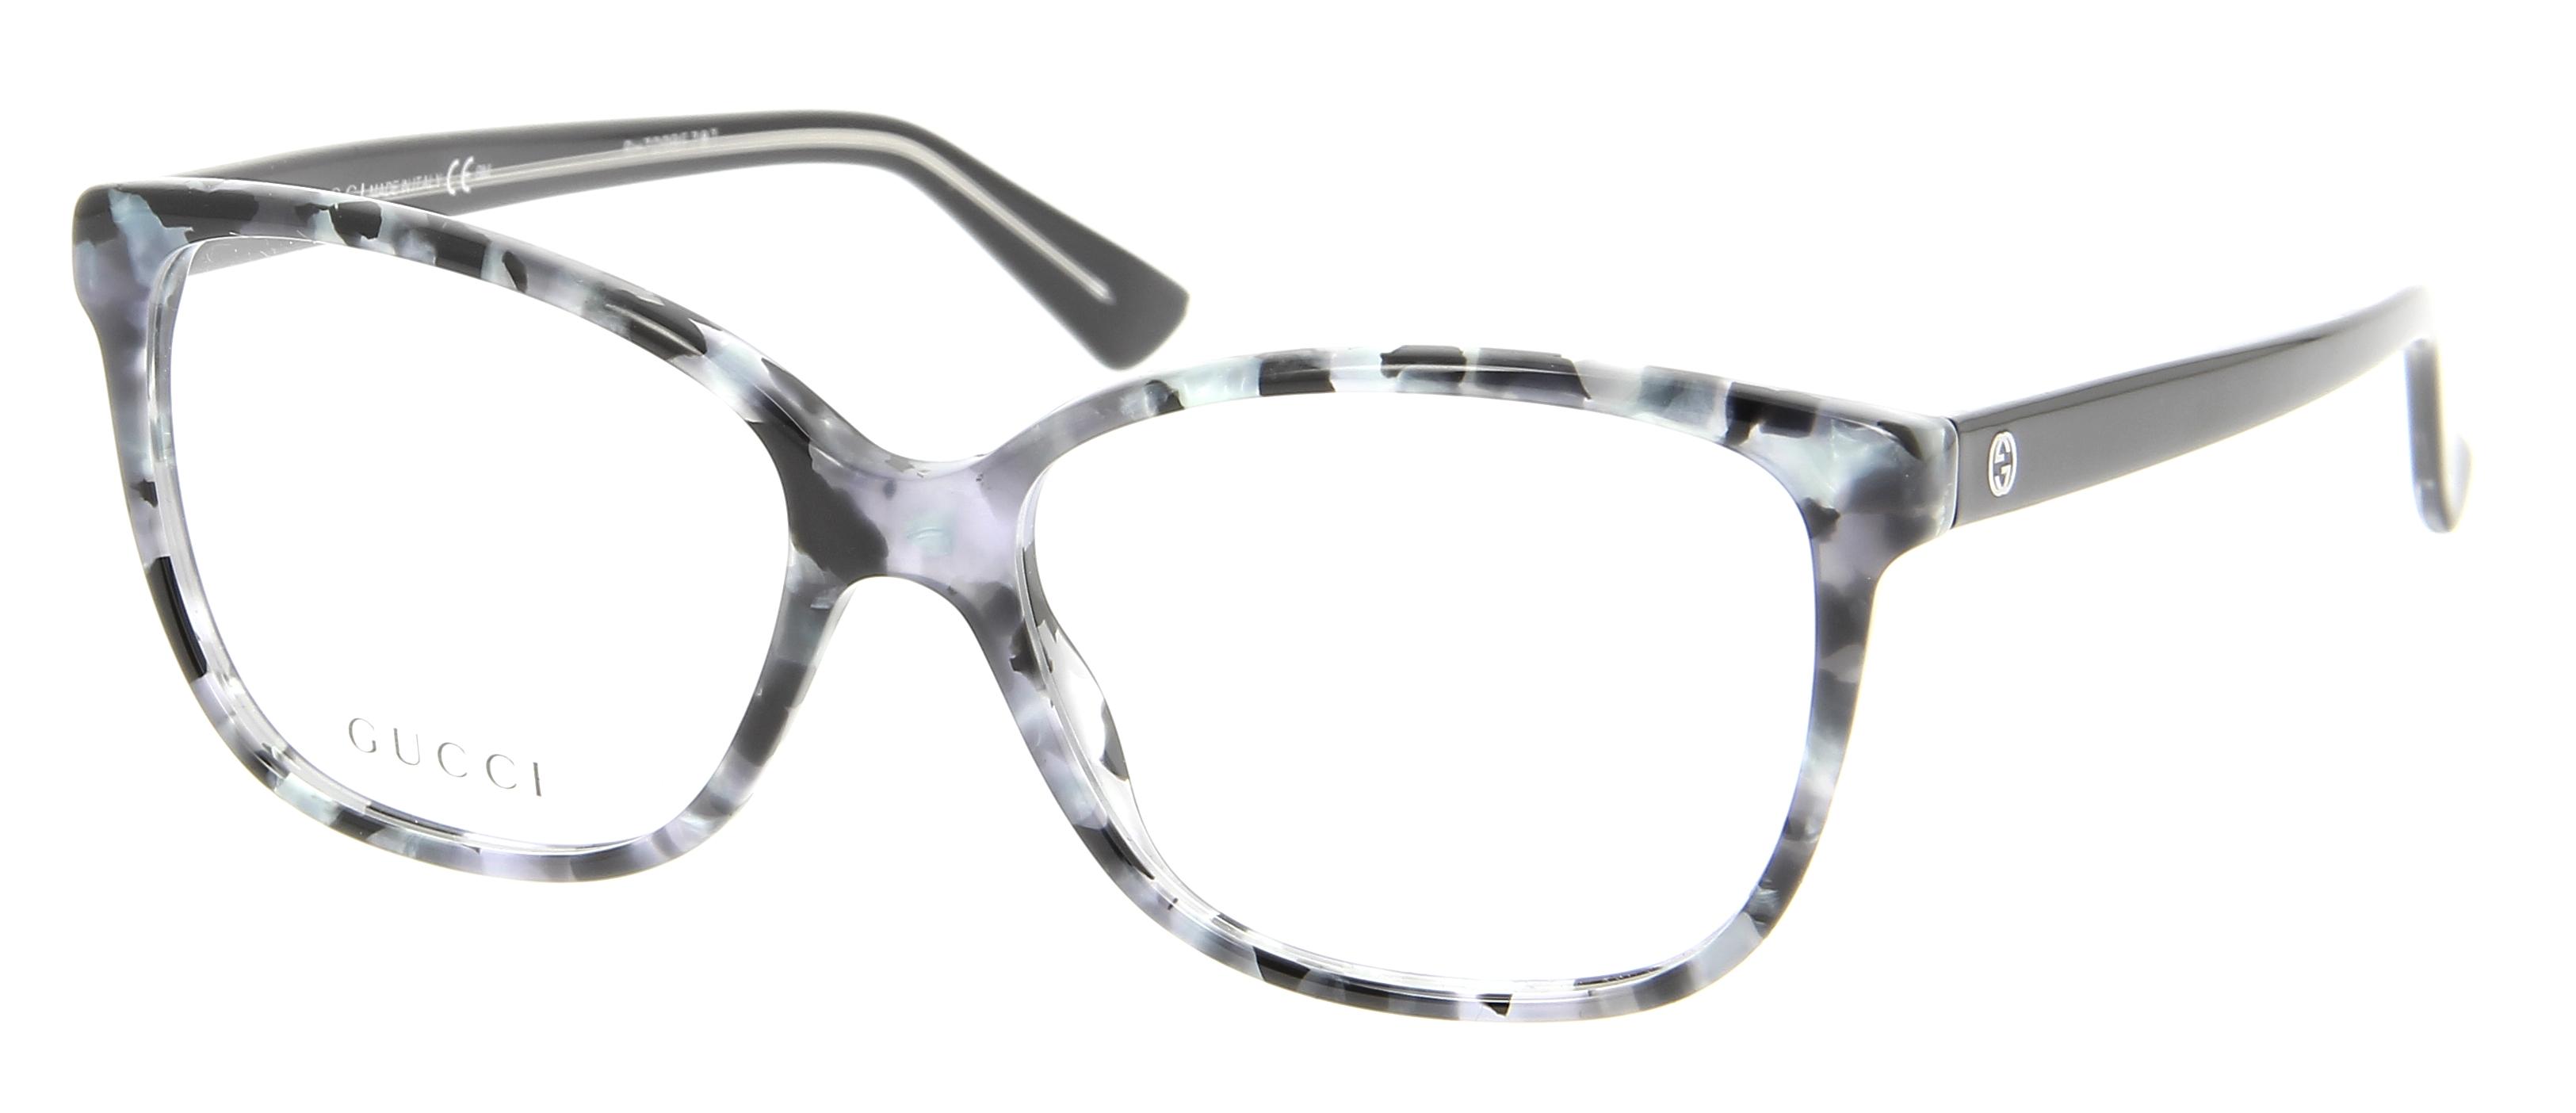 lunettes de vue gucci gg 3724 hnw 53 15 femme ecaille. Black Bedroom Furniture Sets. Home Design Ideas